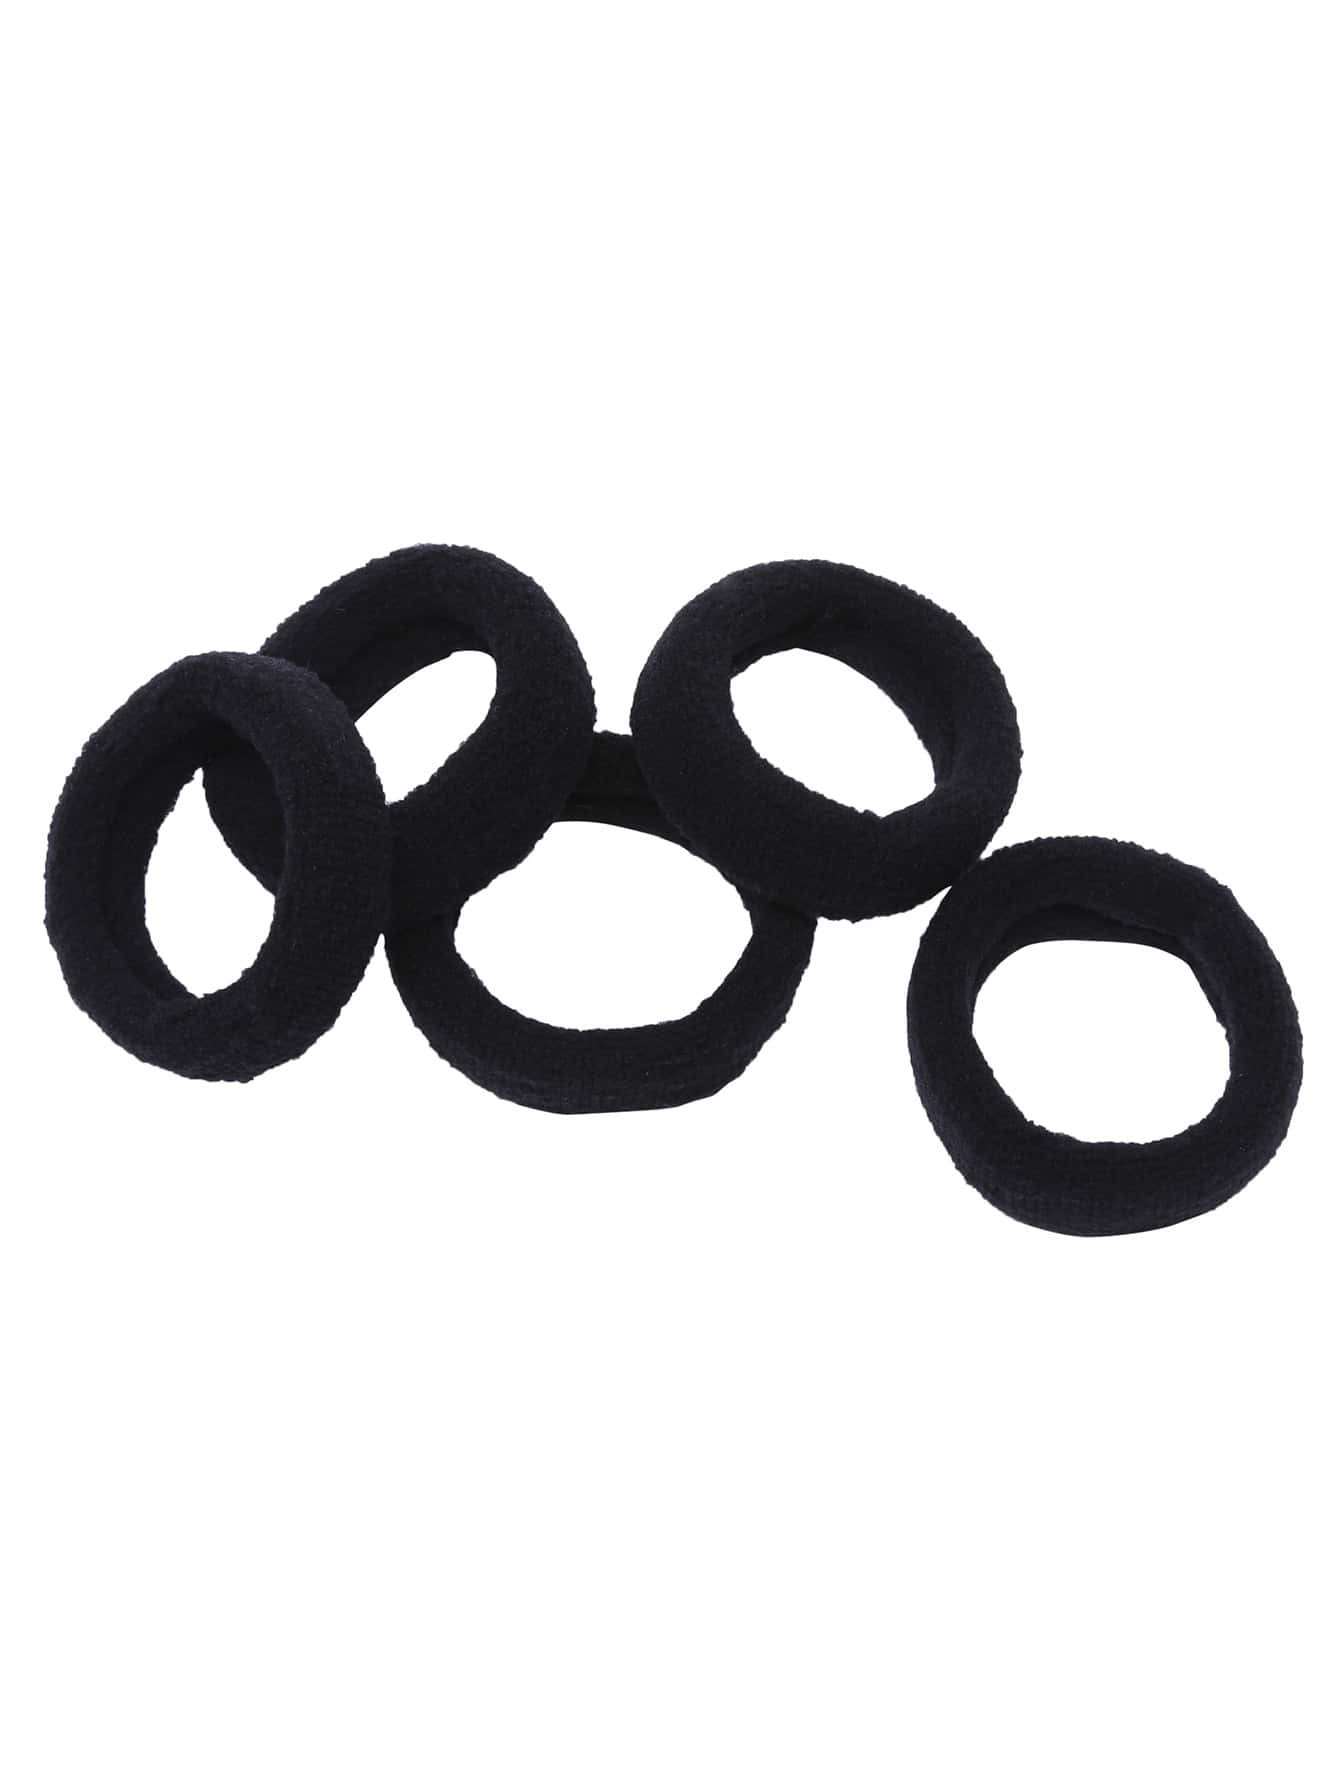 Black Wide Elastic Hair Tie Set 5Pcs